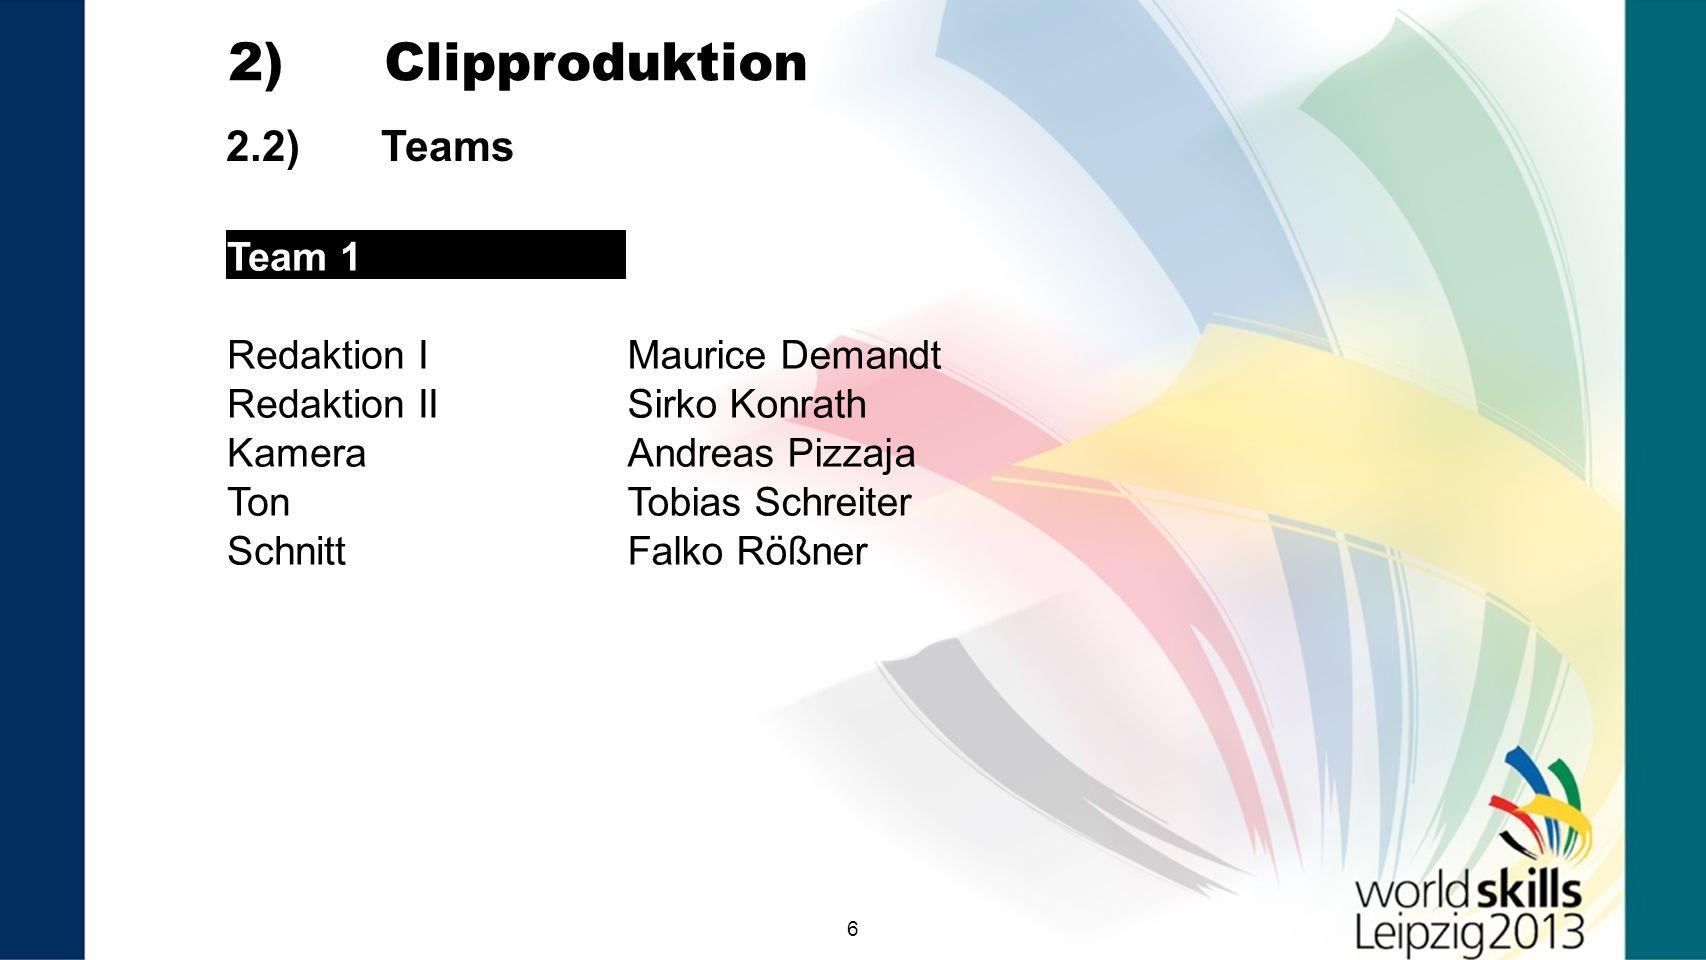 66 2.2) Teams 2) Clipproduktion Team 1 Redaktion IMaurice Demandt Redaktion IISirko Konrath KameraAndreas Pizzaja TonTobias Schreiter SchnittFalko Röß